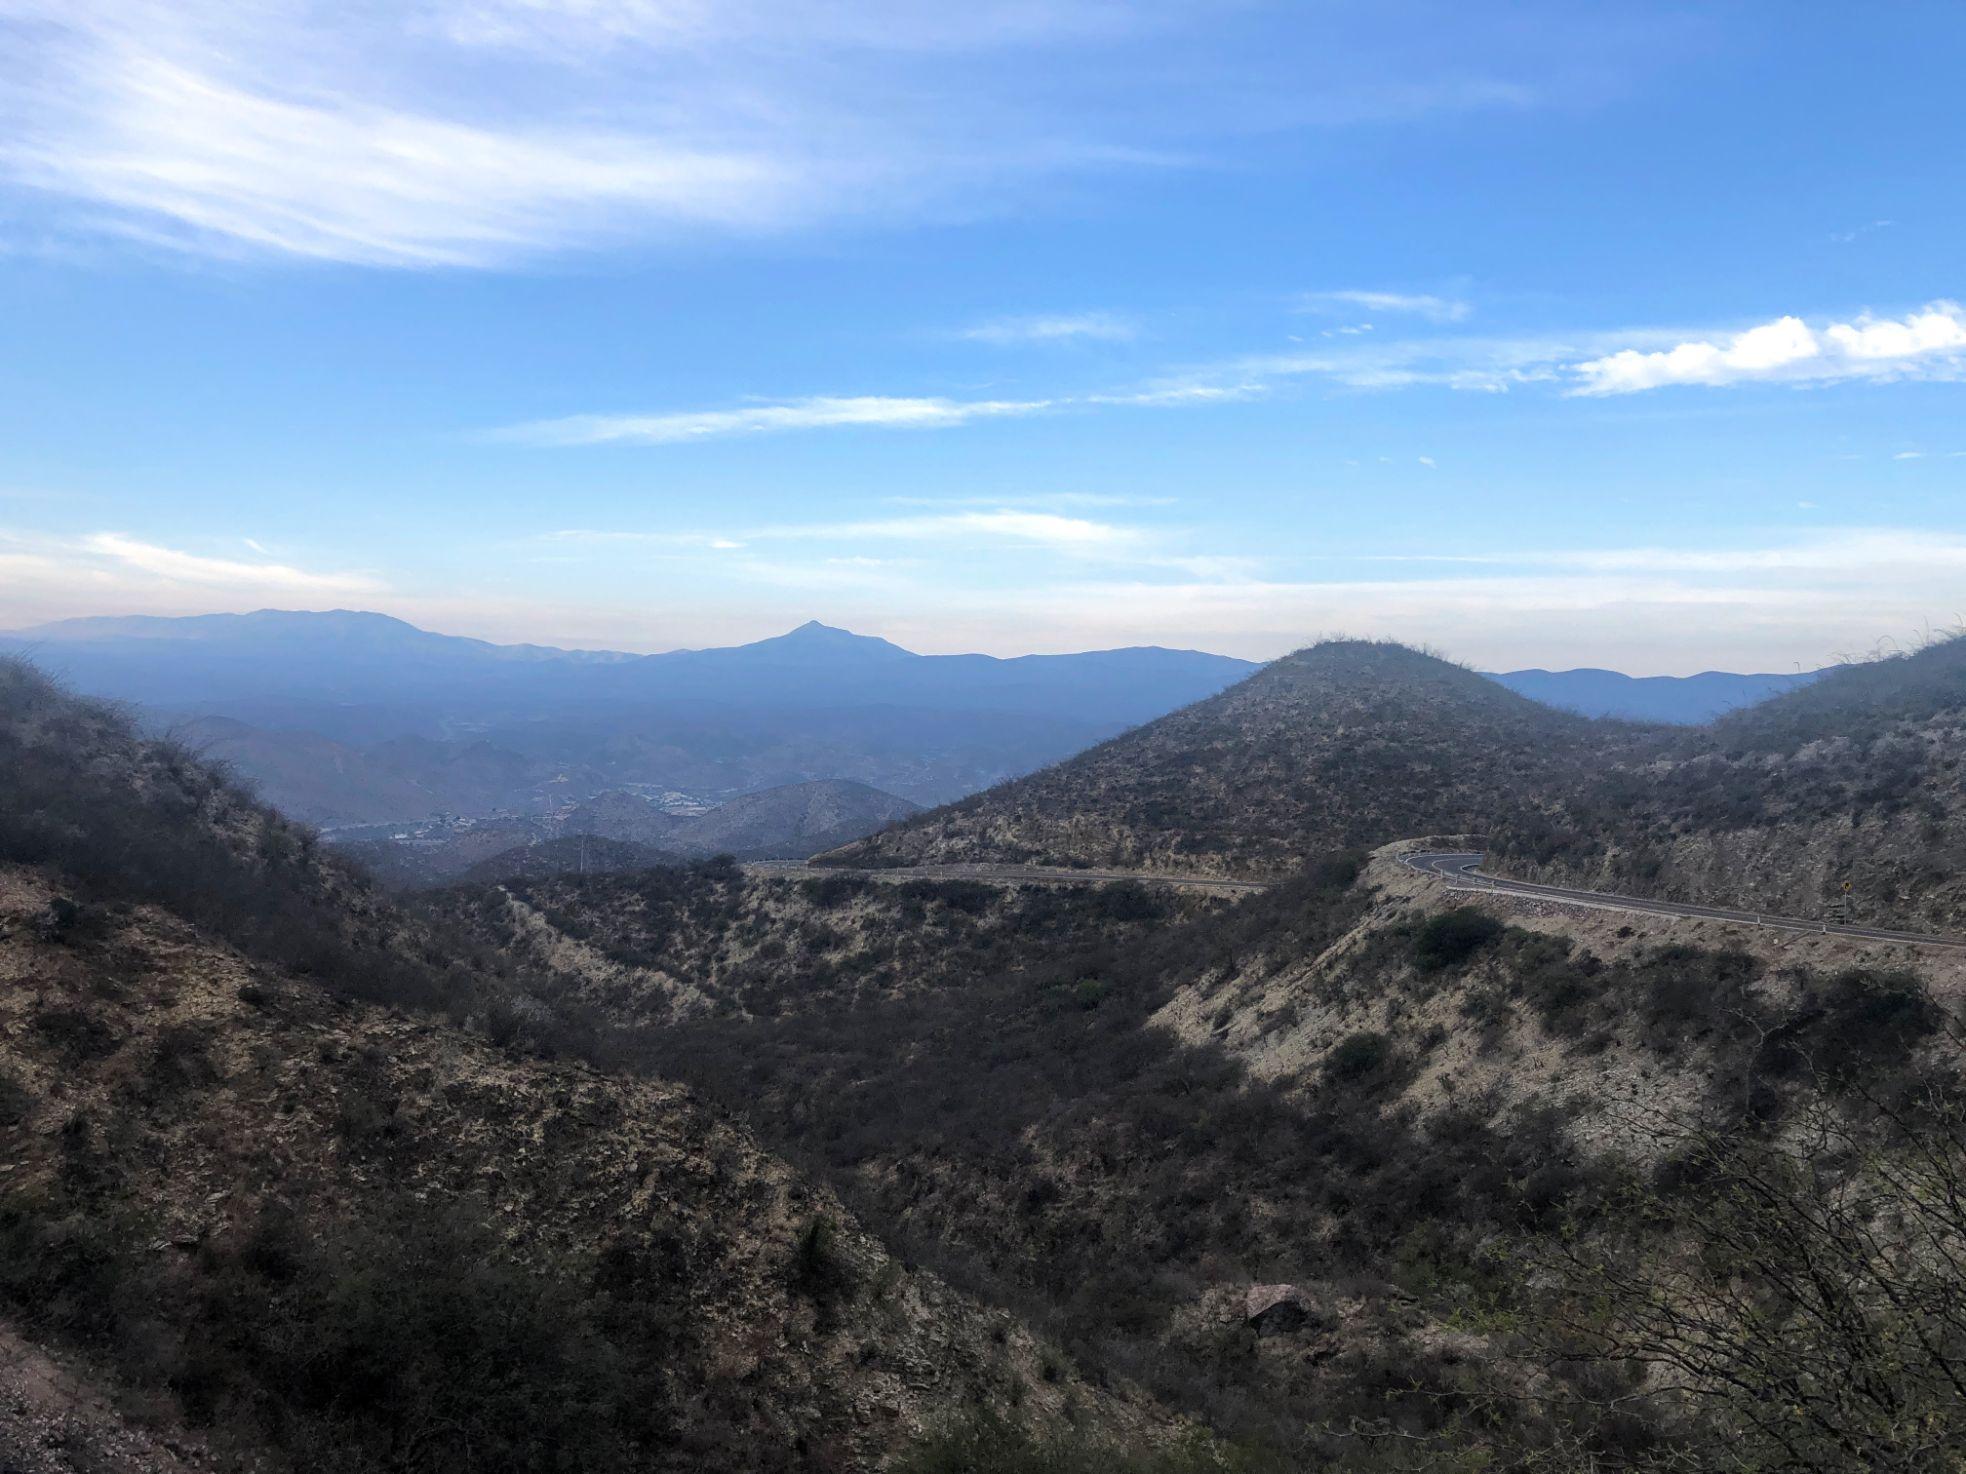 driving into the Sierra Gorda Biosphere Reserve